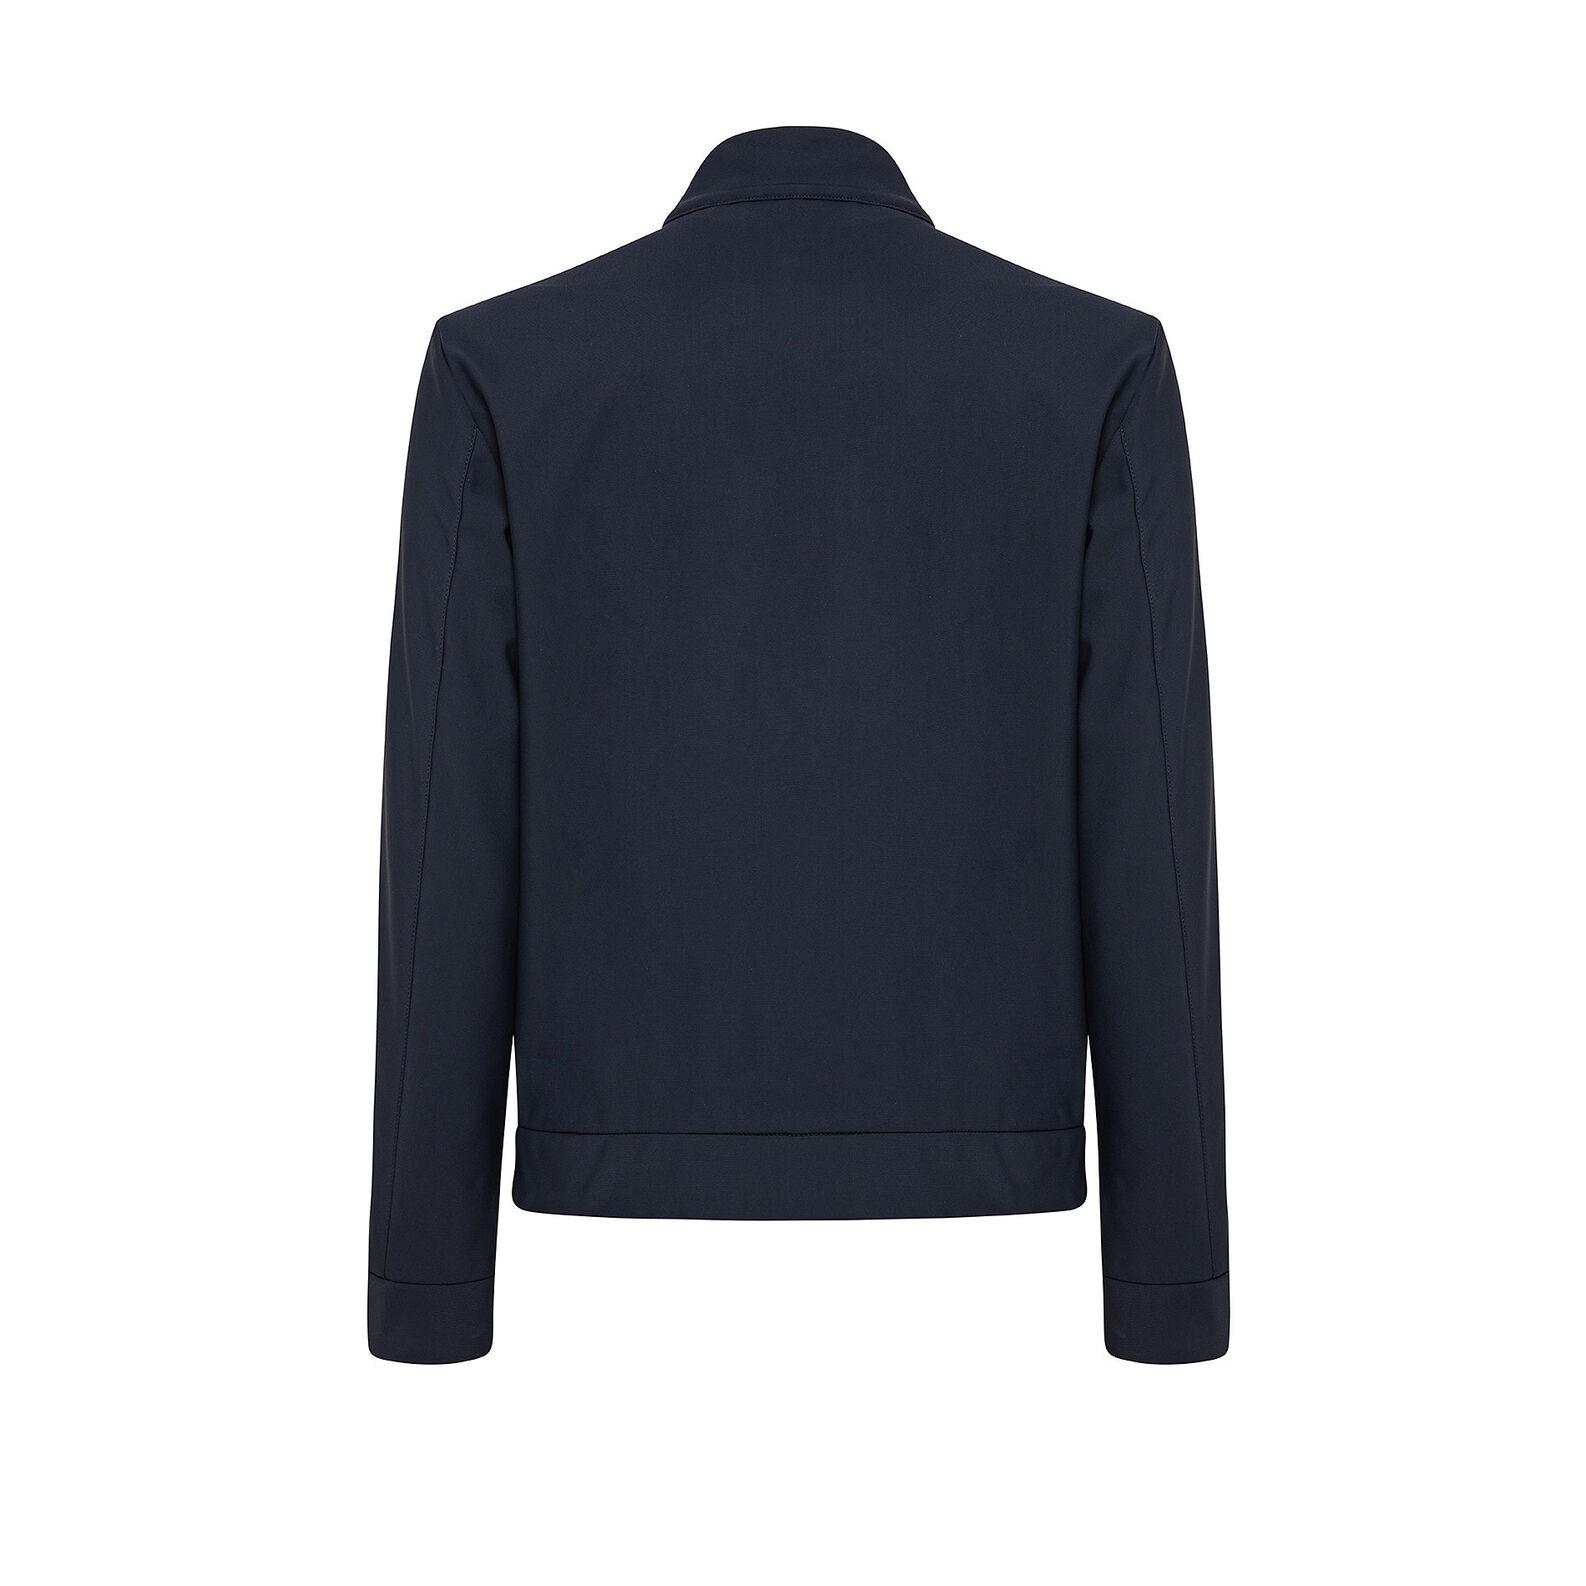 High collar jacket with zip